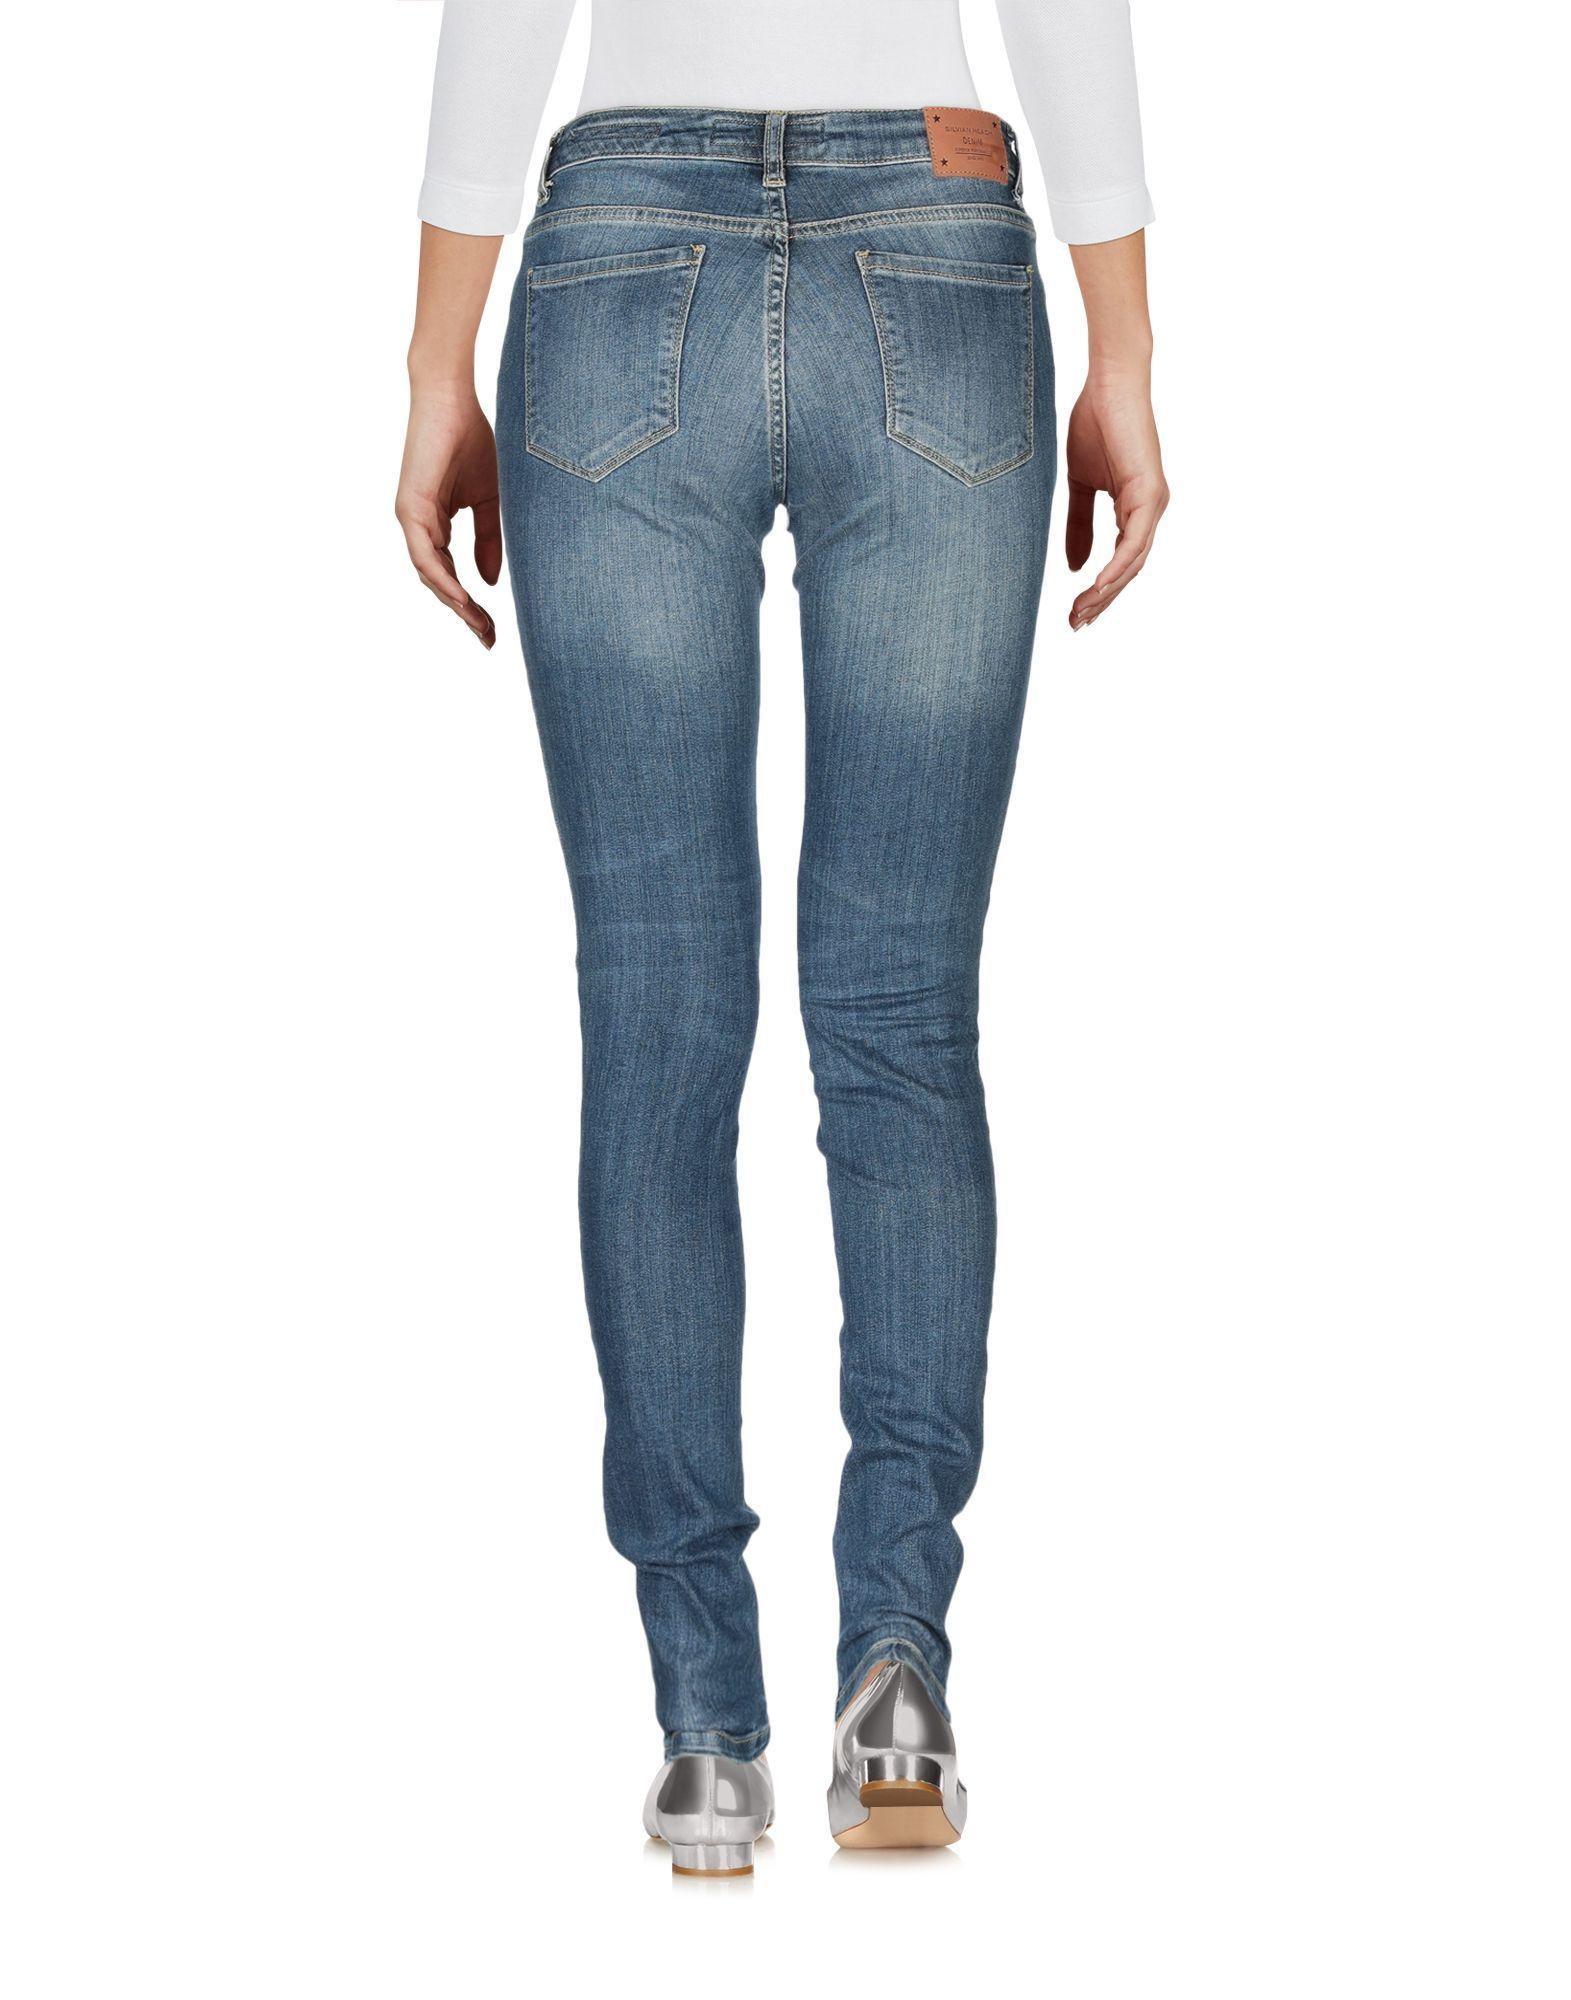 Silvian Heach Women's Denim Trousers Cotton